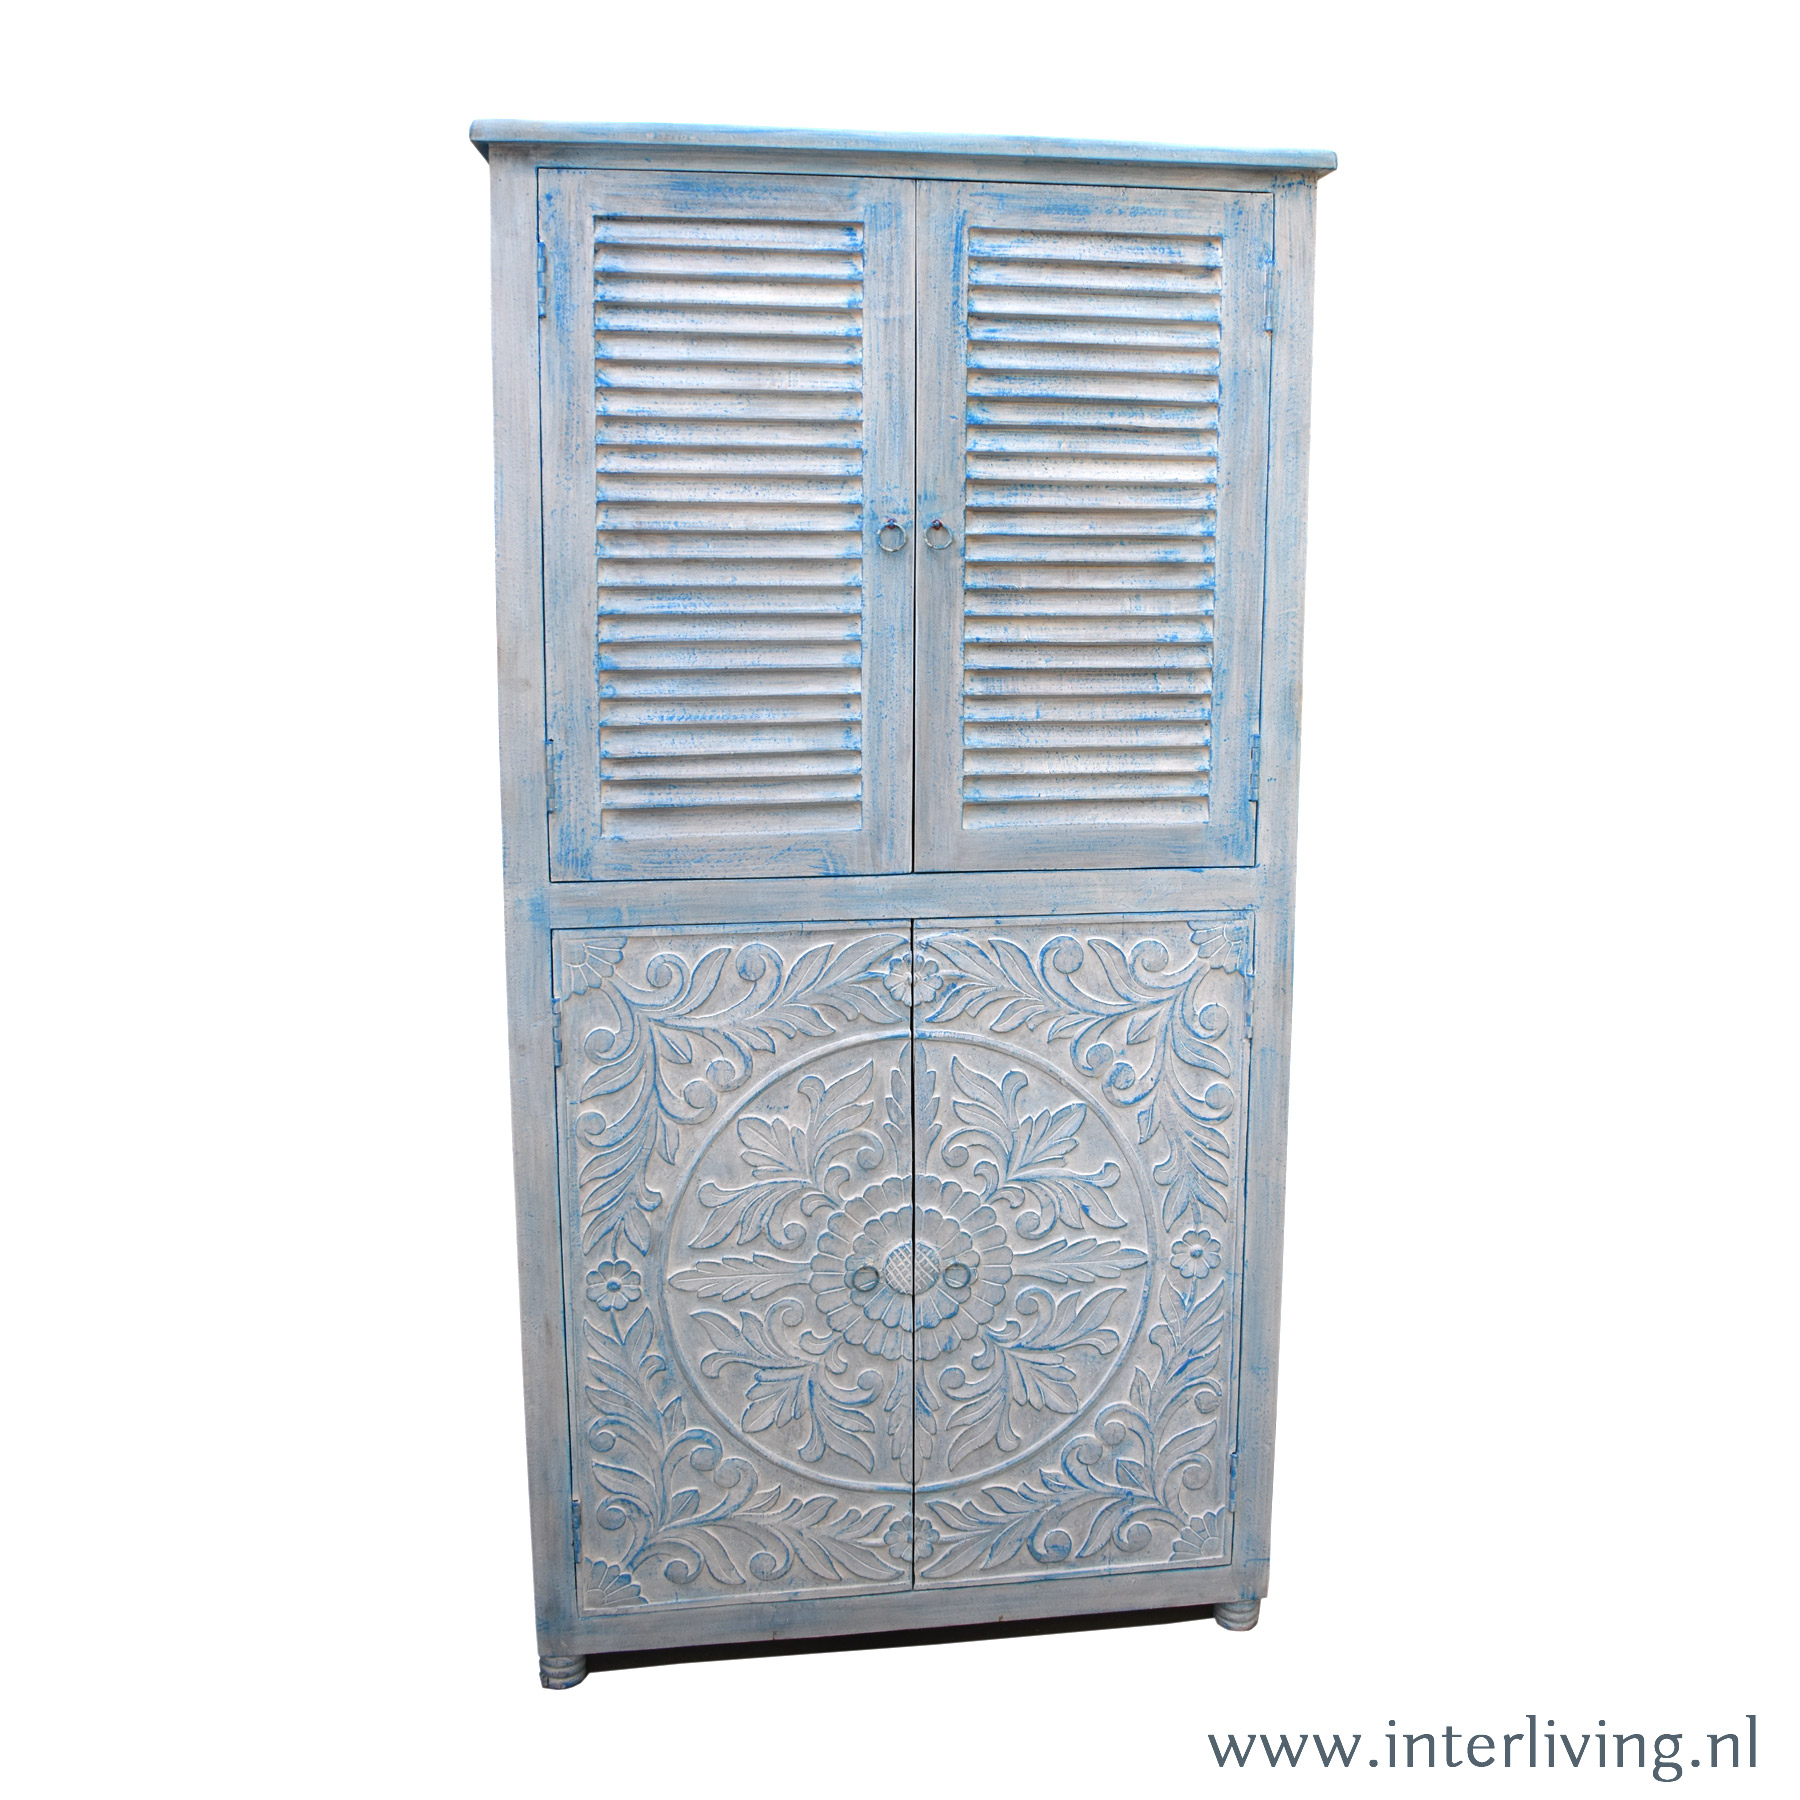 buffetkast - vier-deurs - met aparte bovenkant van Louvre lamellen en onder houtsnijwerk van lotus bloemen - handgemaakt - vintage blue washed verf